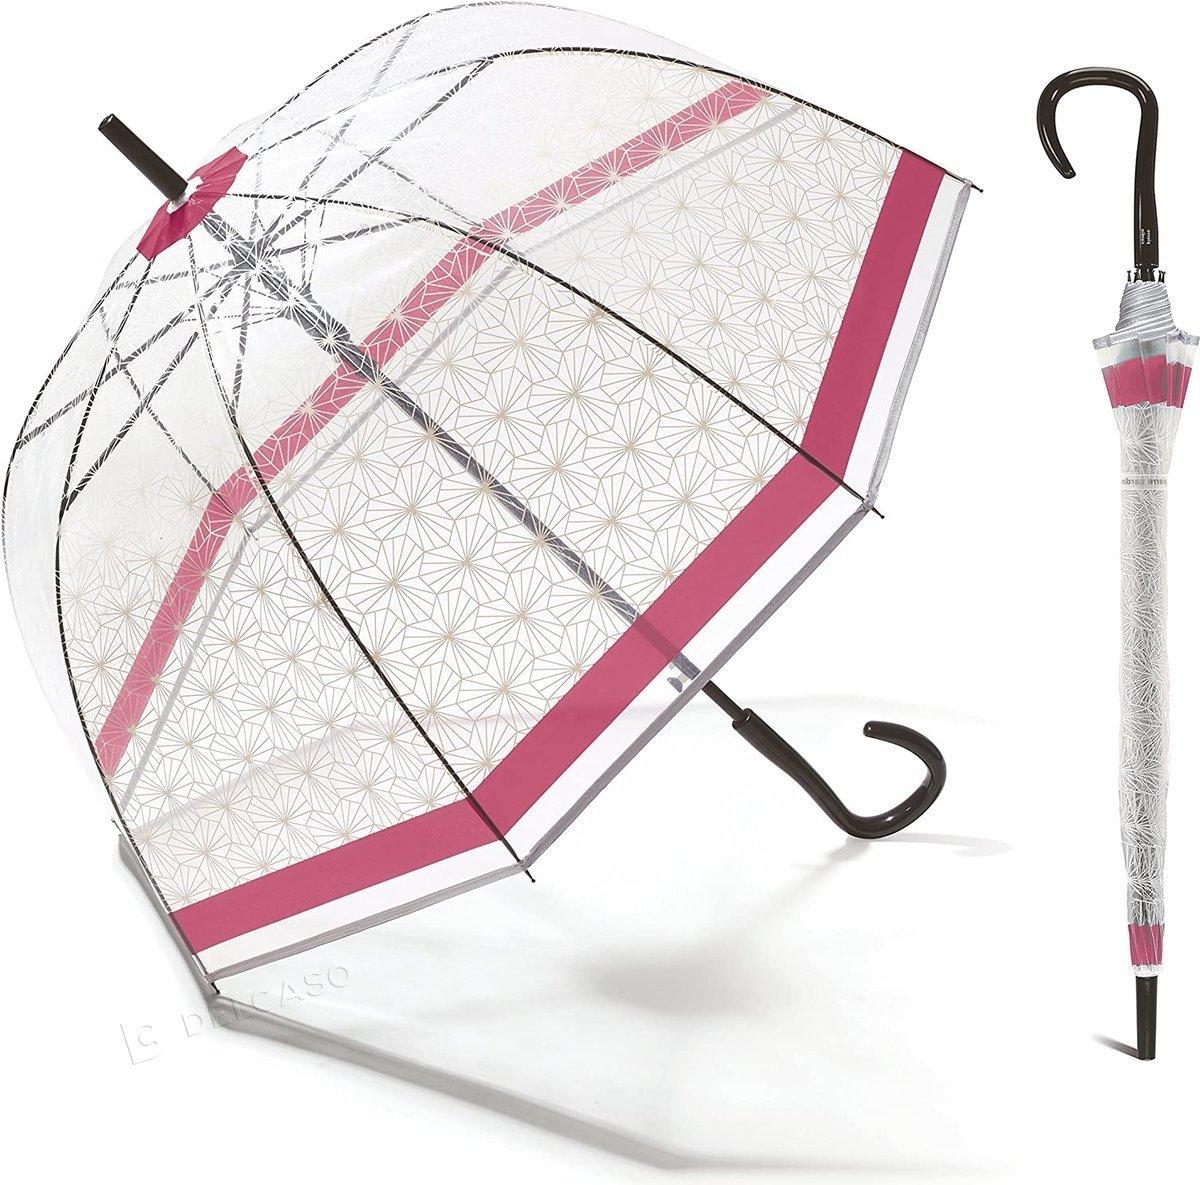 Parasol przeźroczysty Pierre Cardin Symetrique Domeshape pink